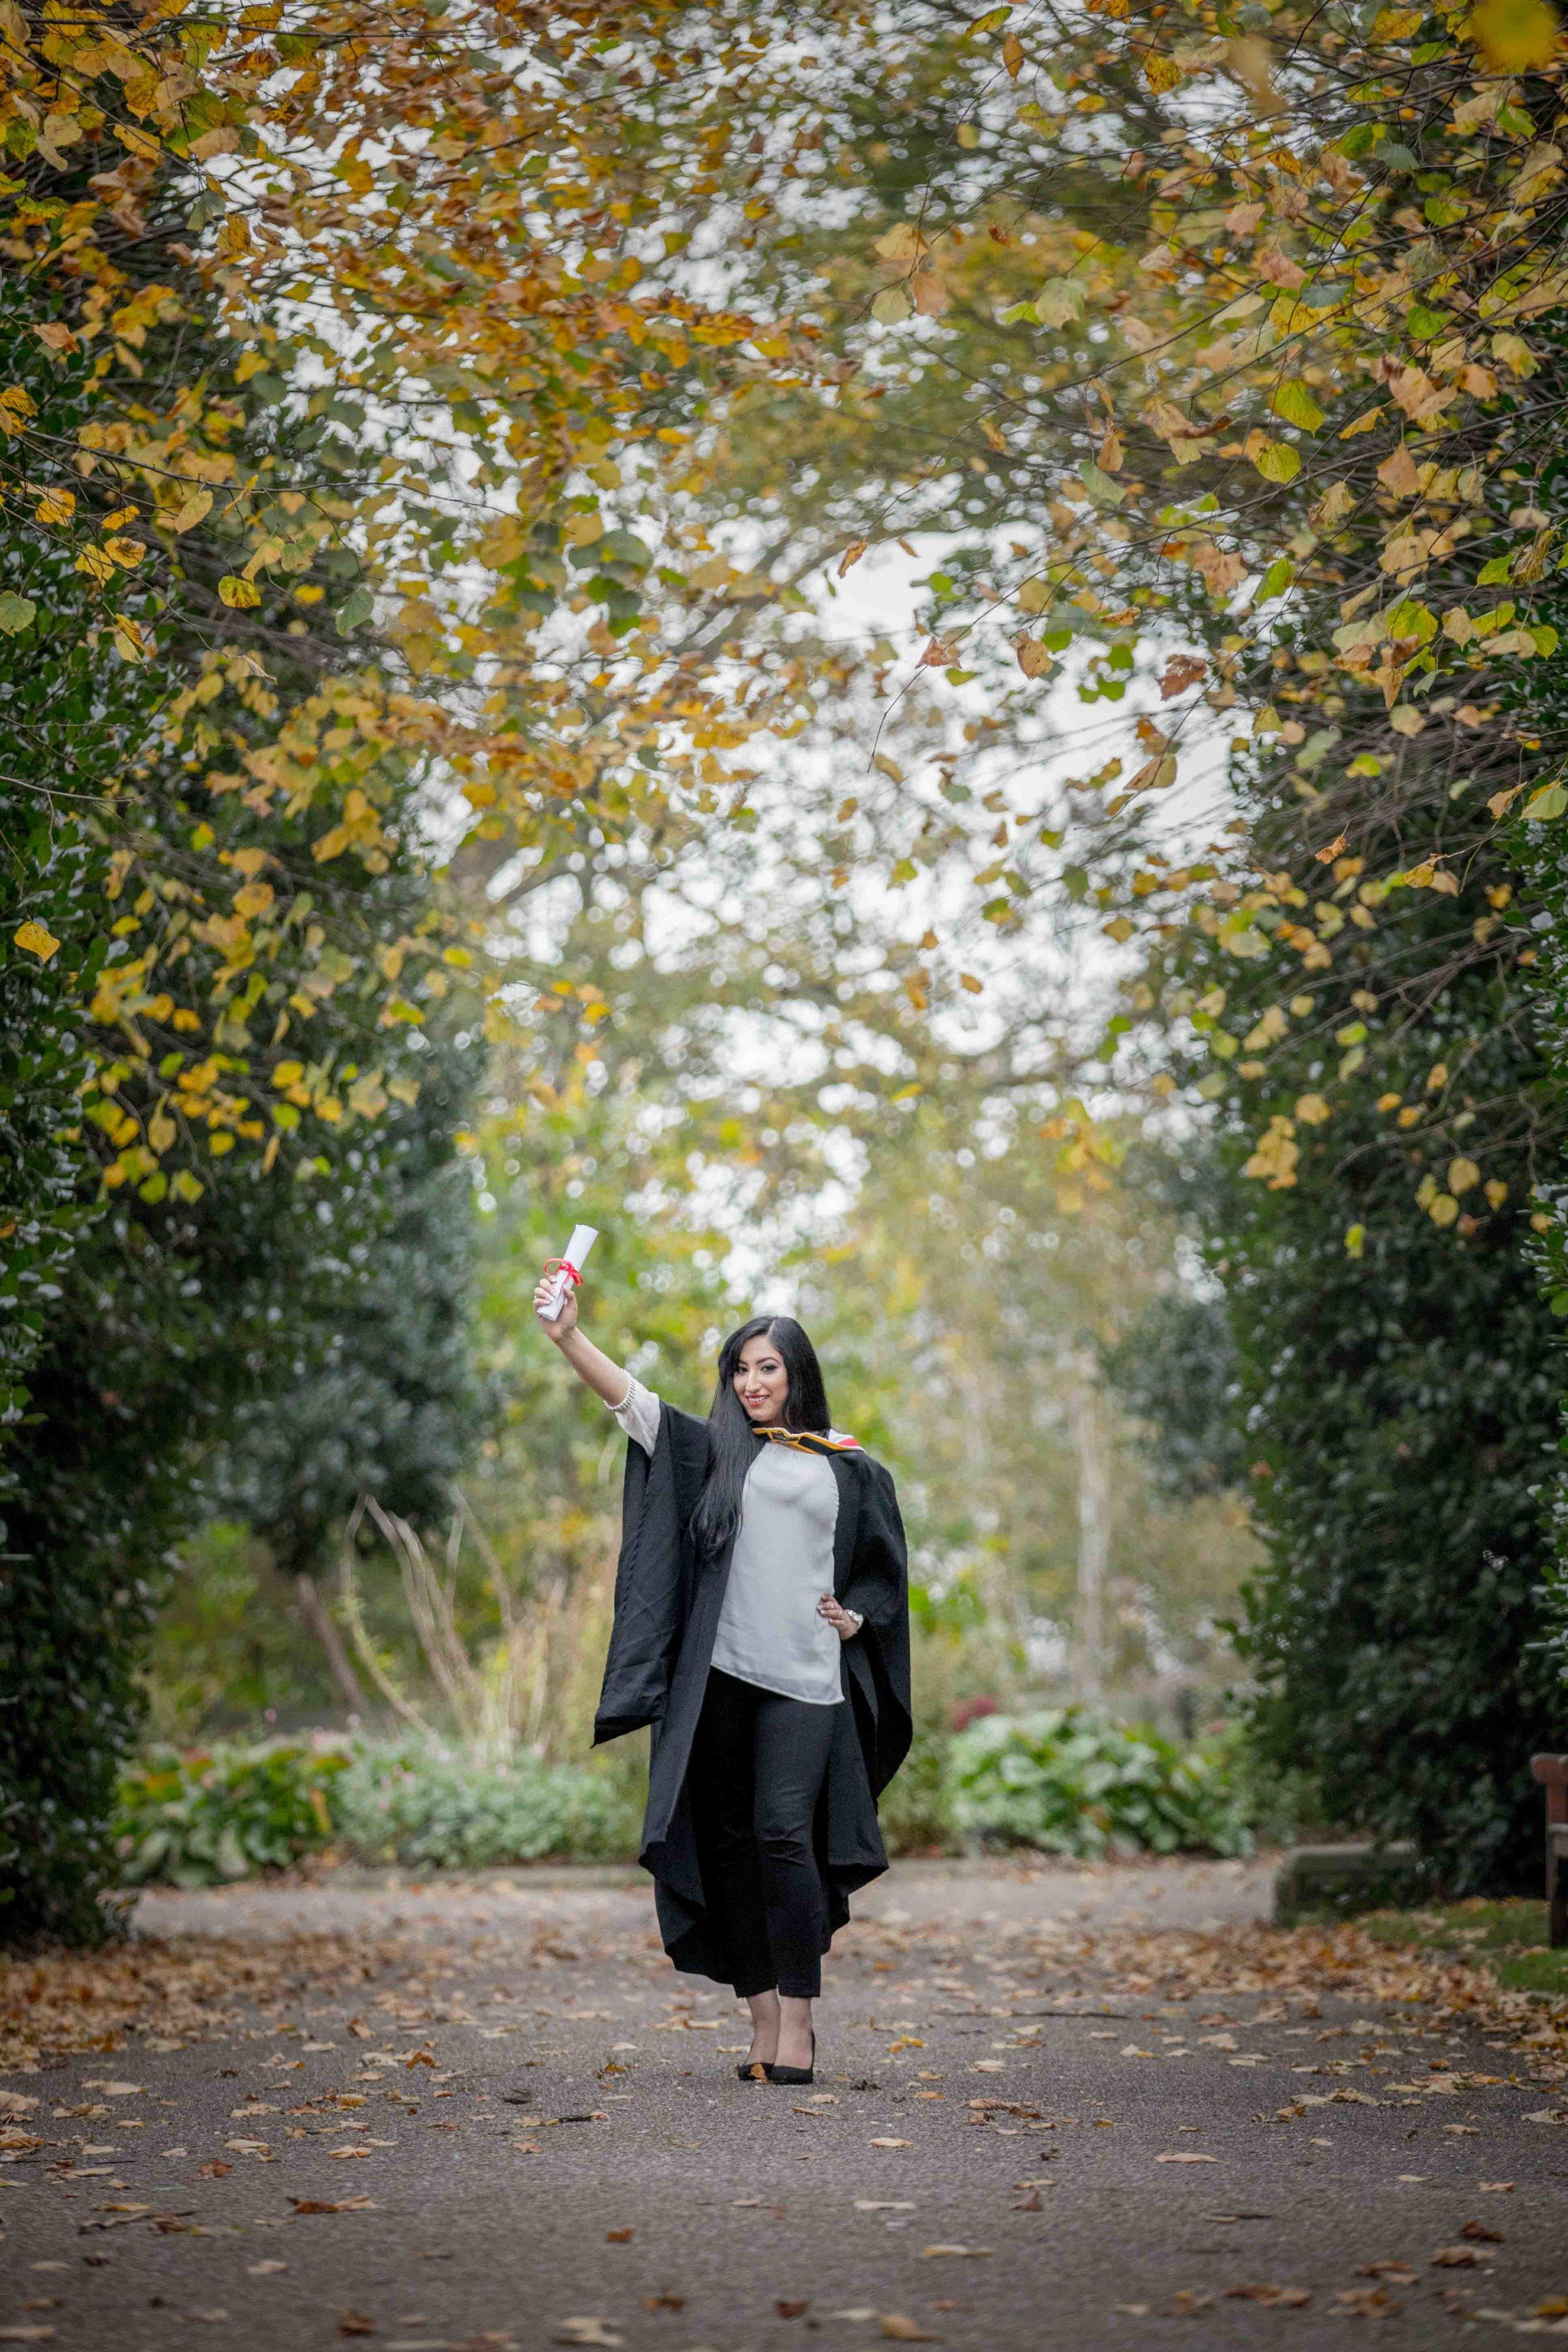 chester-university-graduation-ceremony-photography-photoshoot-graduation-photographer-Bristol-London-Cardiff-Birmingham-Chester-Natalia-smith-photography-14.jpg